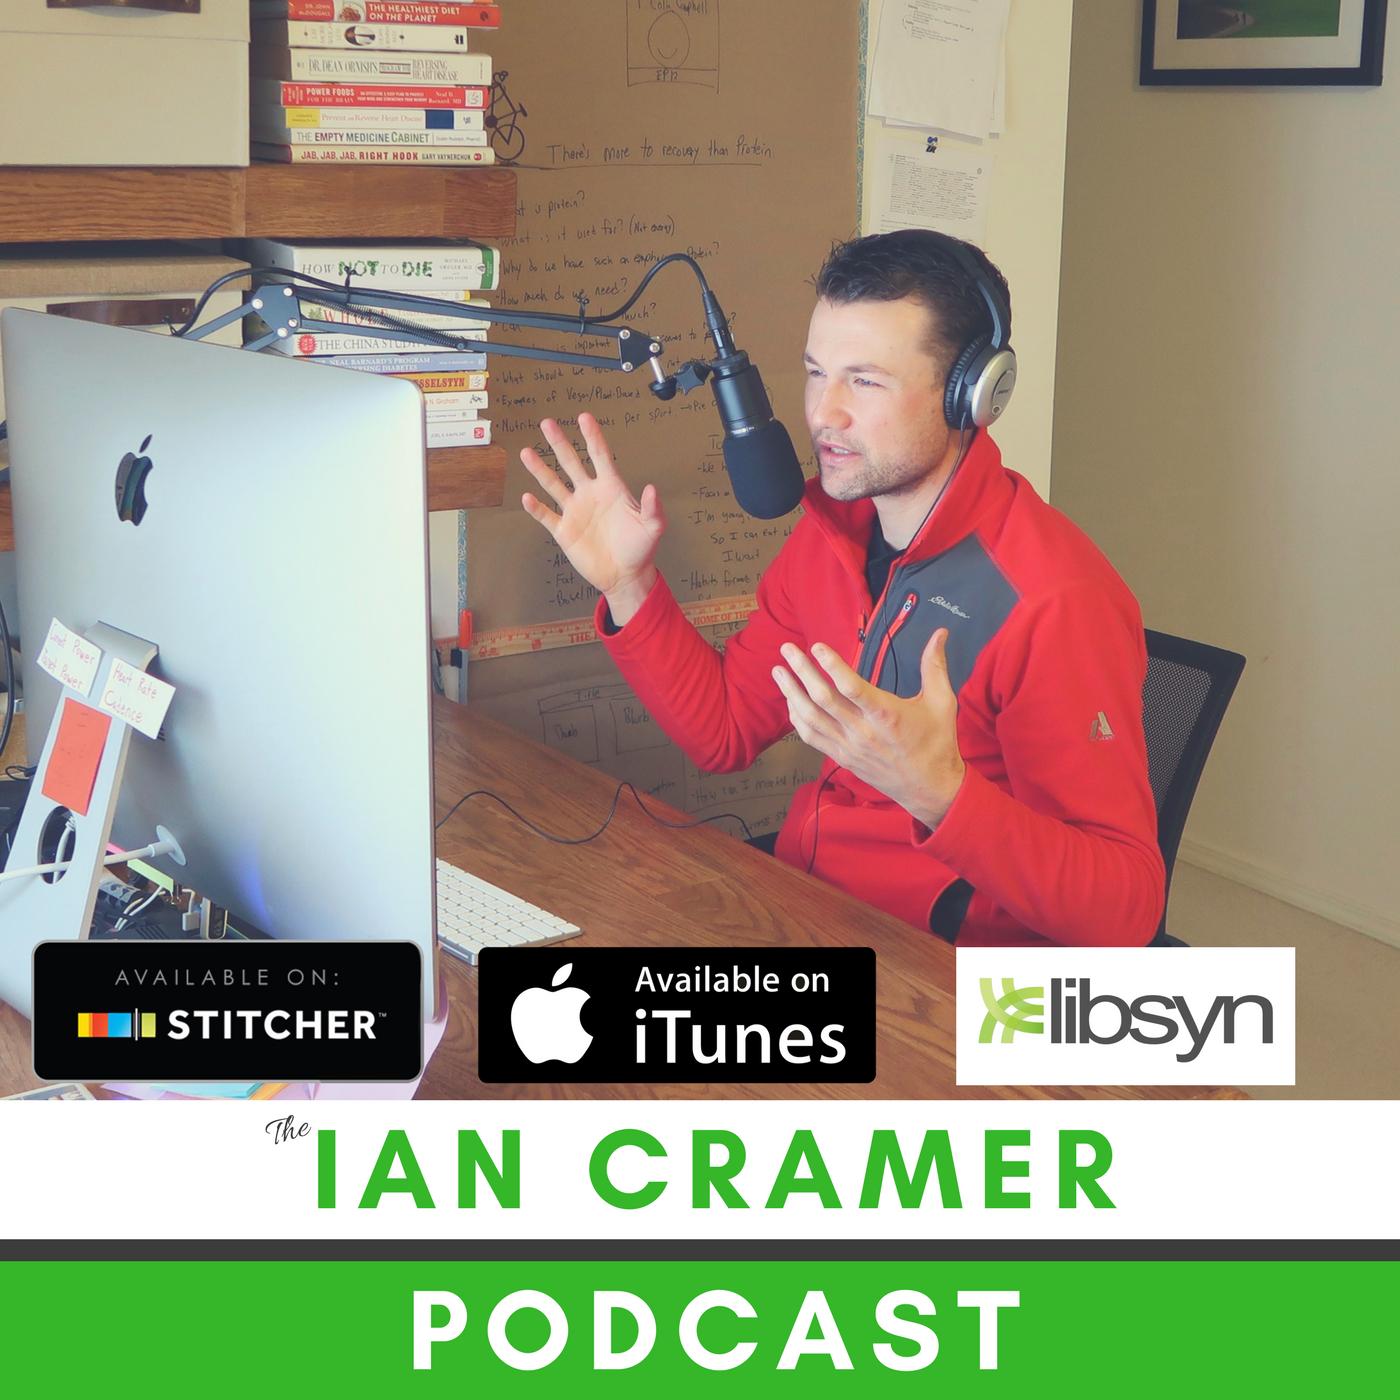 The Ian Cramer Podcast